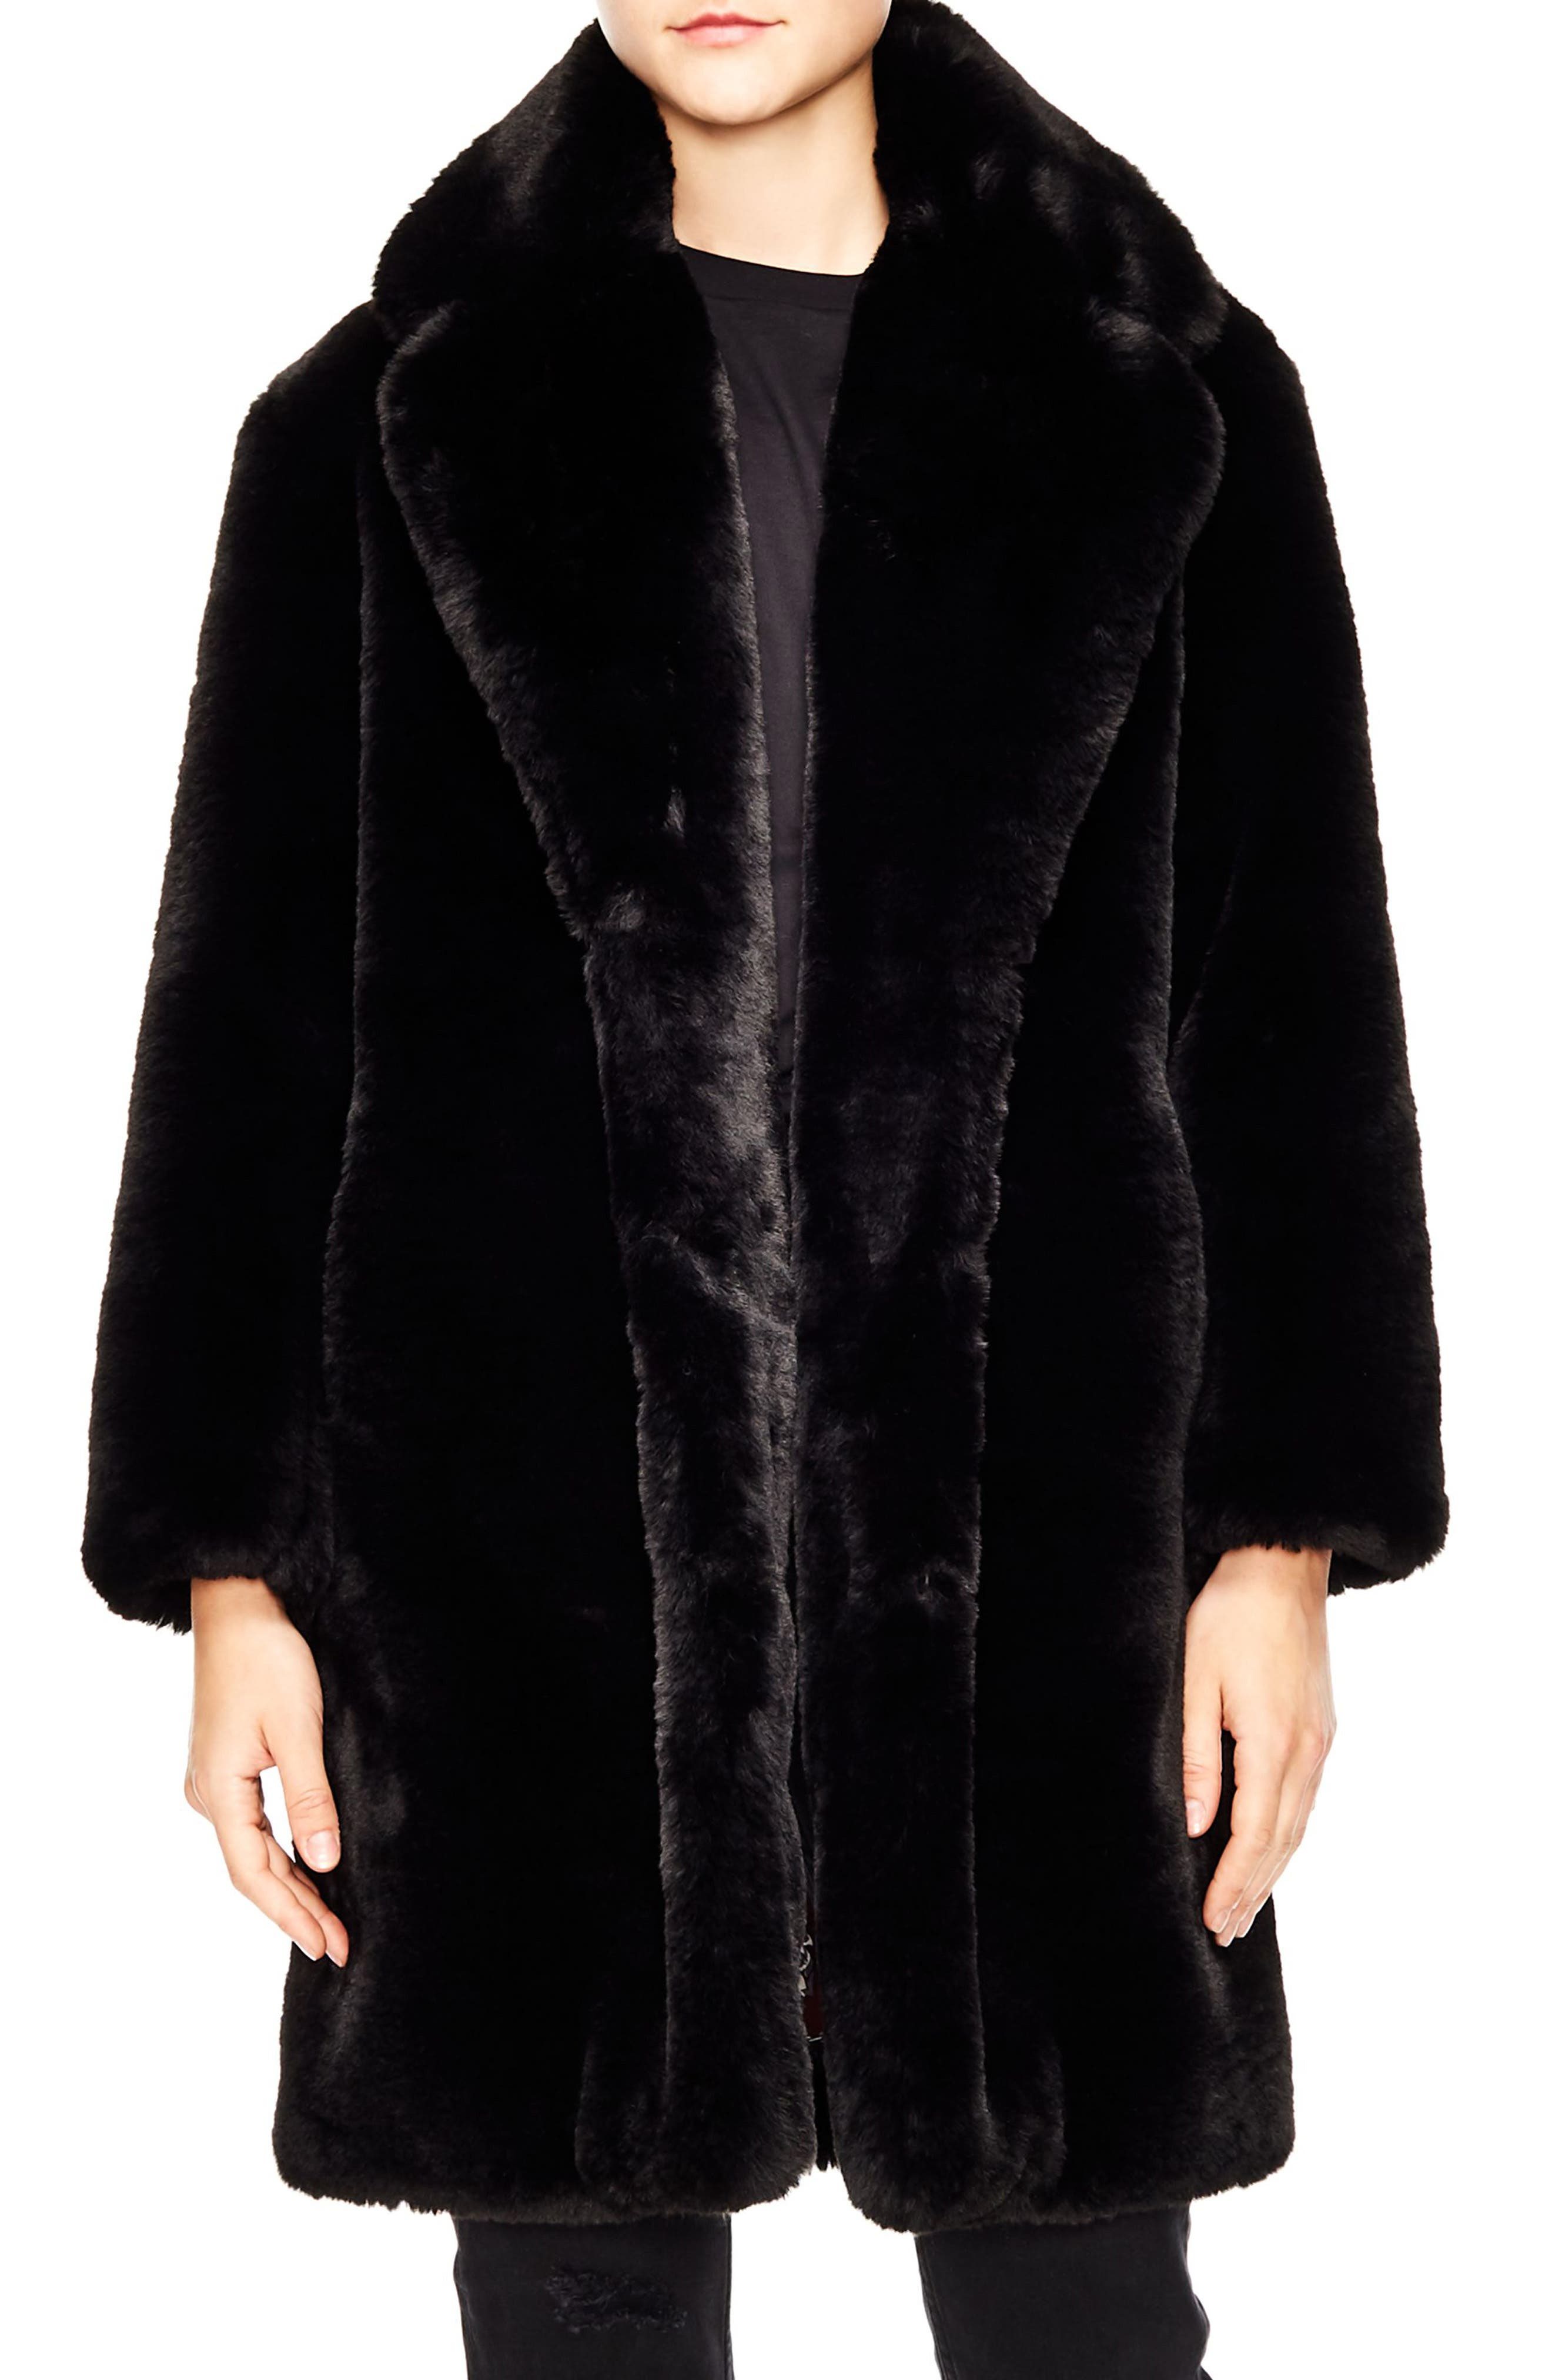 Ballote Faux Fur Coat,                             Main thumbnail 1, color,                             BLACK